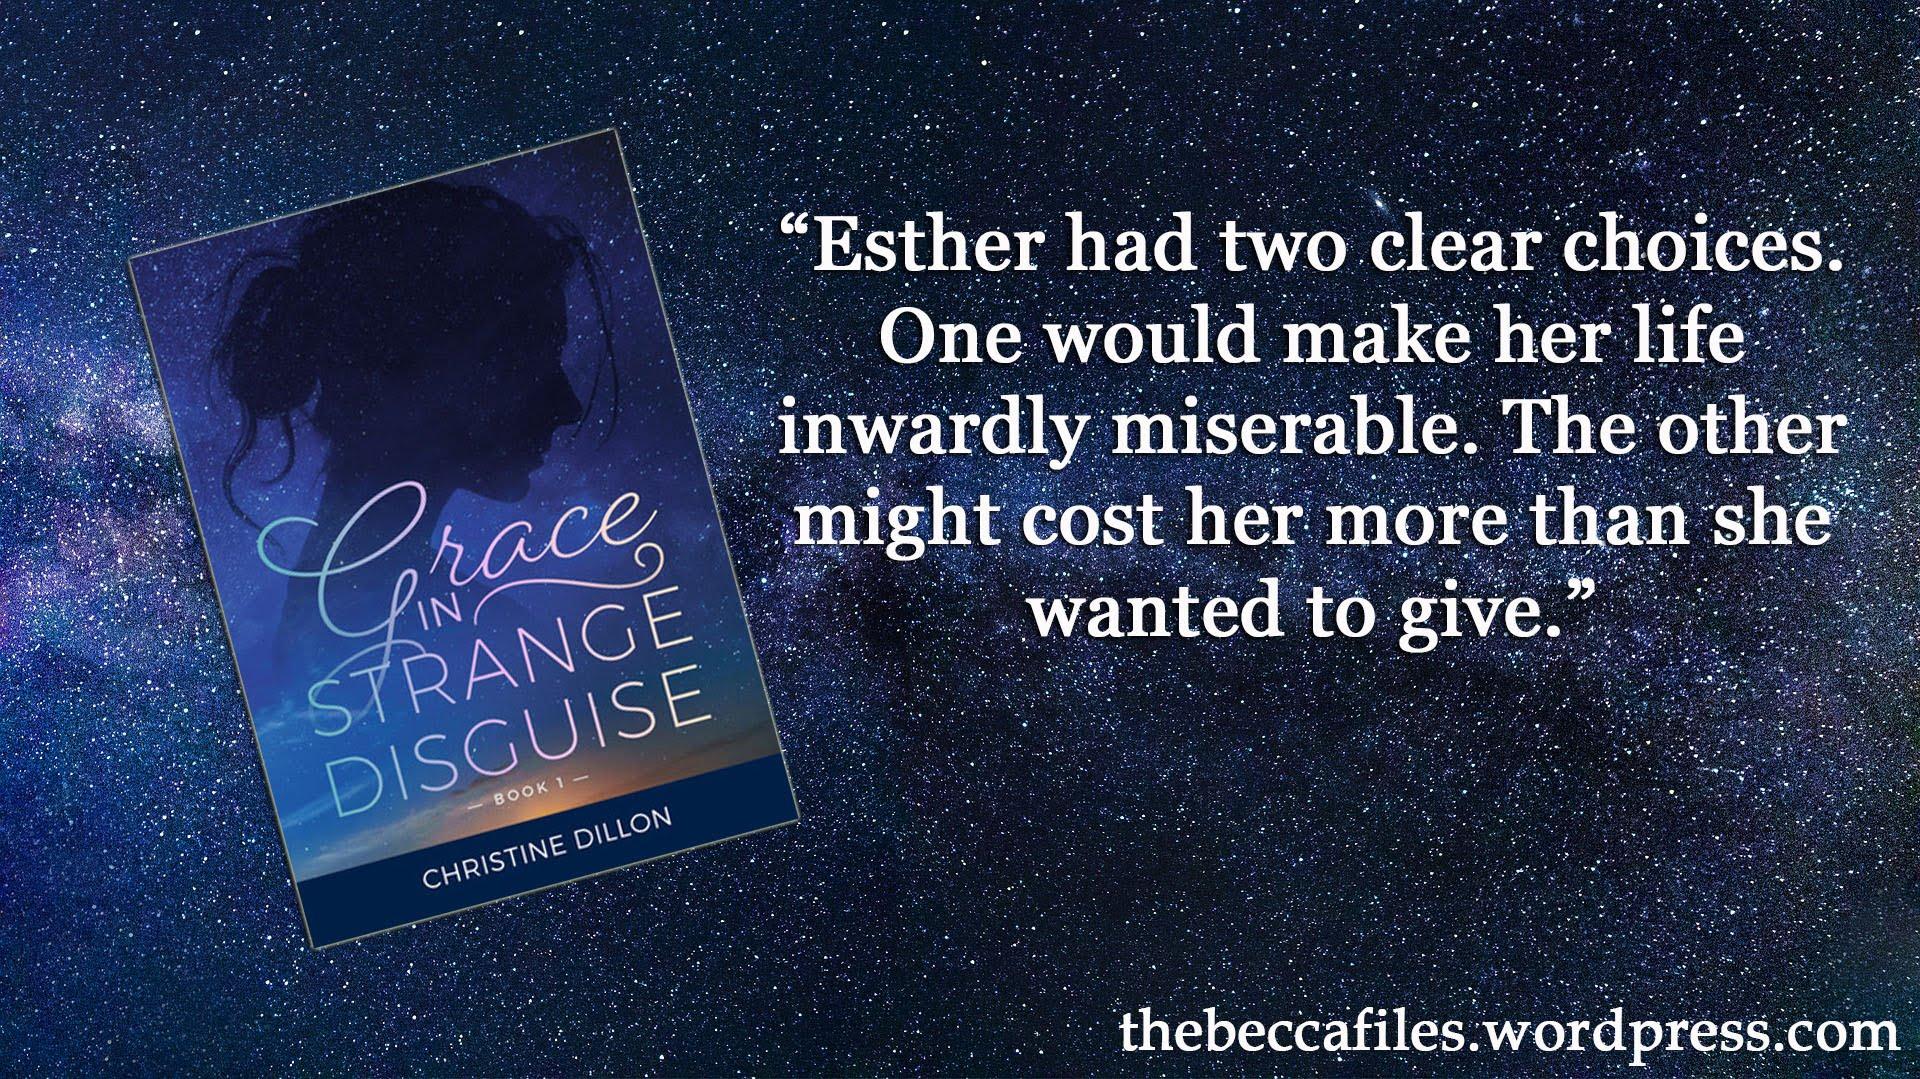 grace-in-strange-disguise2